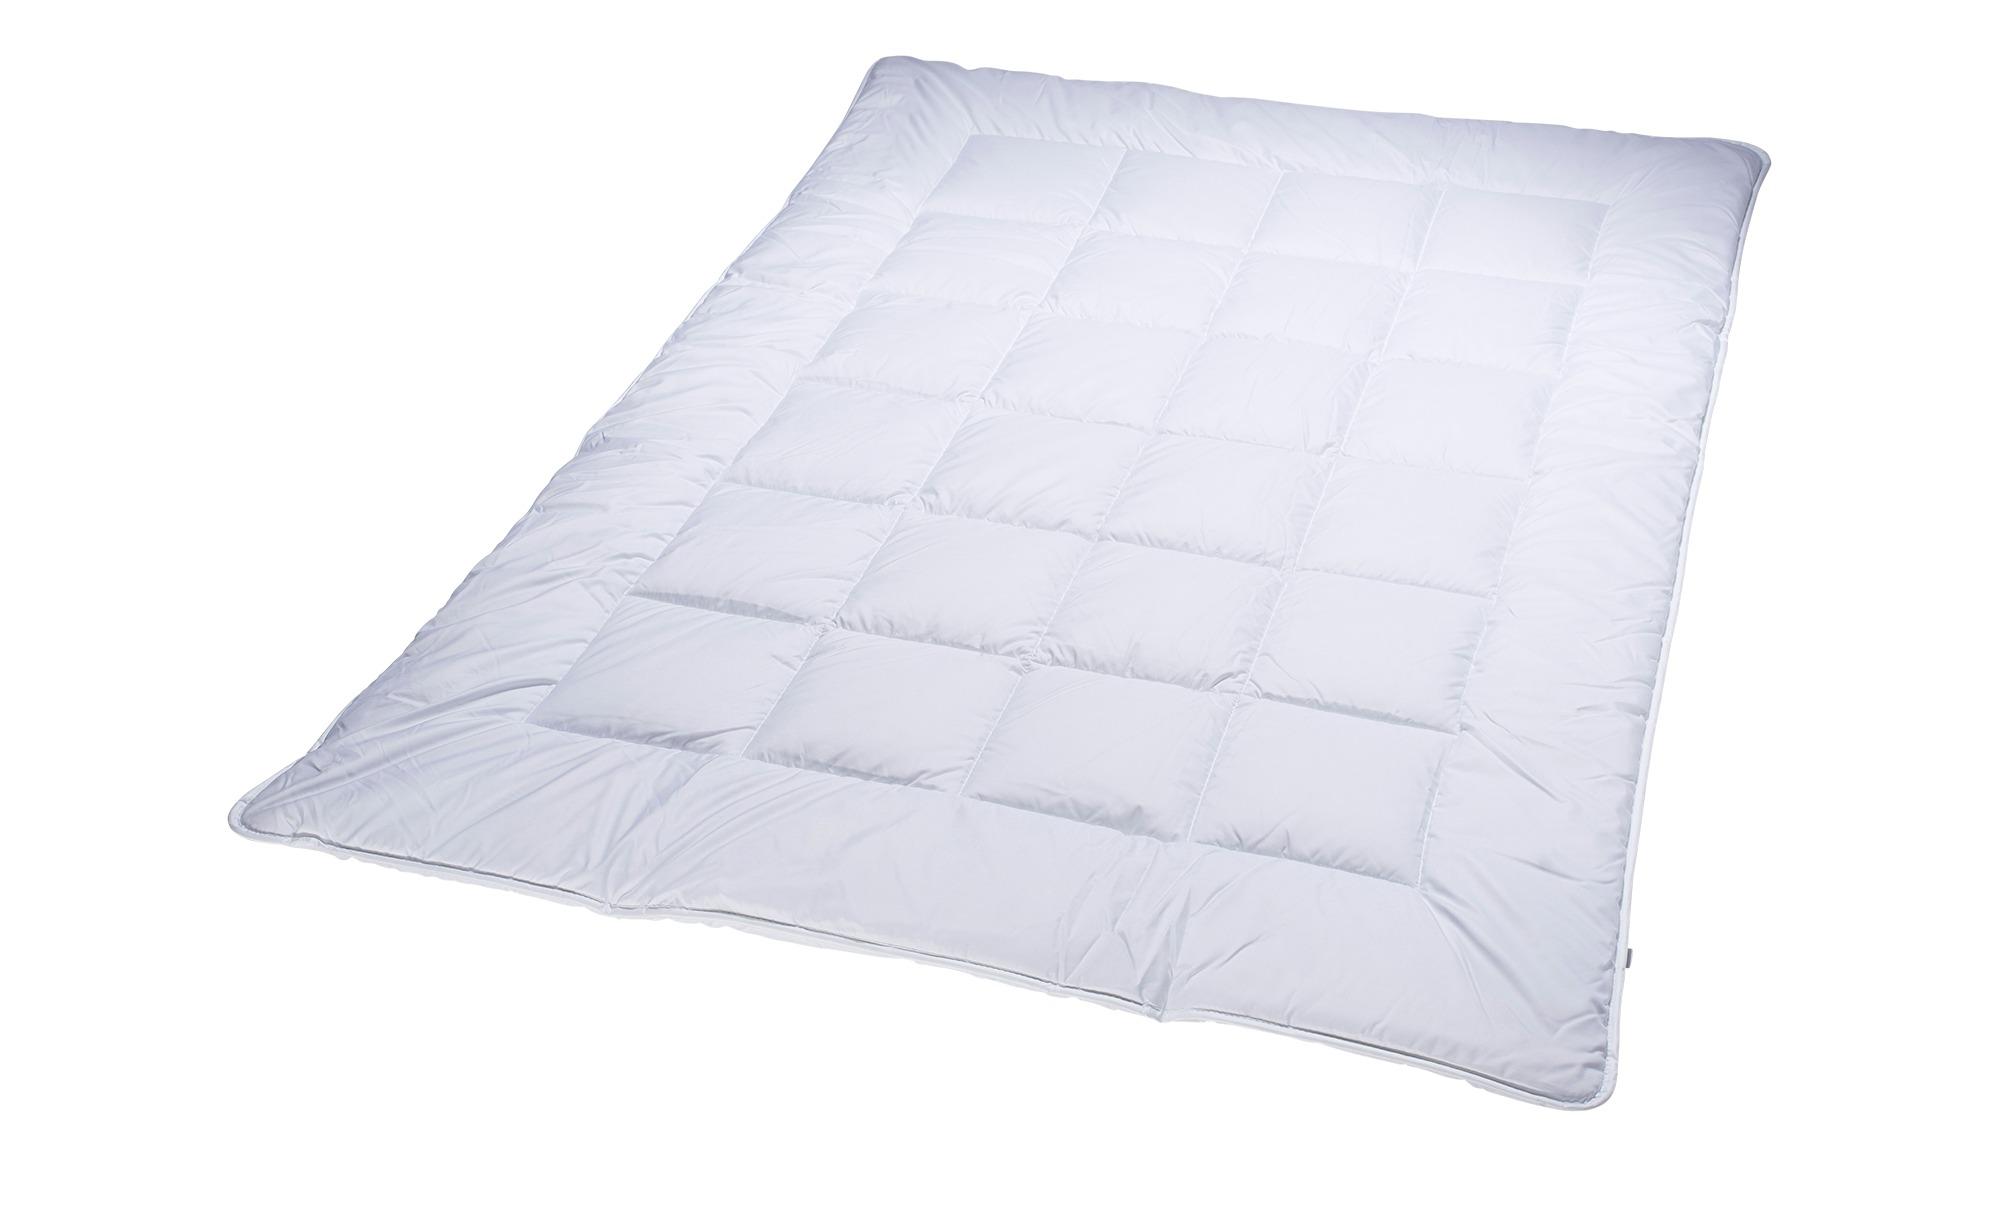 Billerbeck Sommer-Steppbett  Granat ¦ weiß ¦ Maße (cm): B: 155 Bettwaren > Bettdecken > Bettdecken in Übergrößen - Höffner